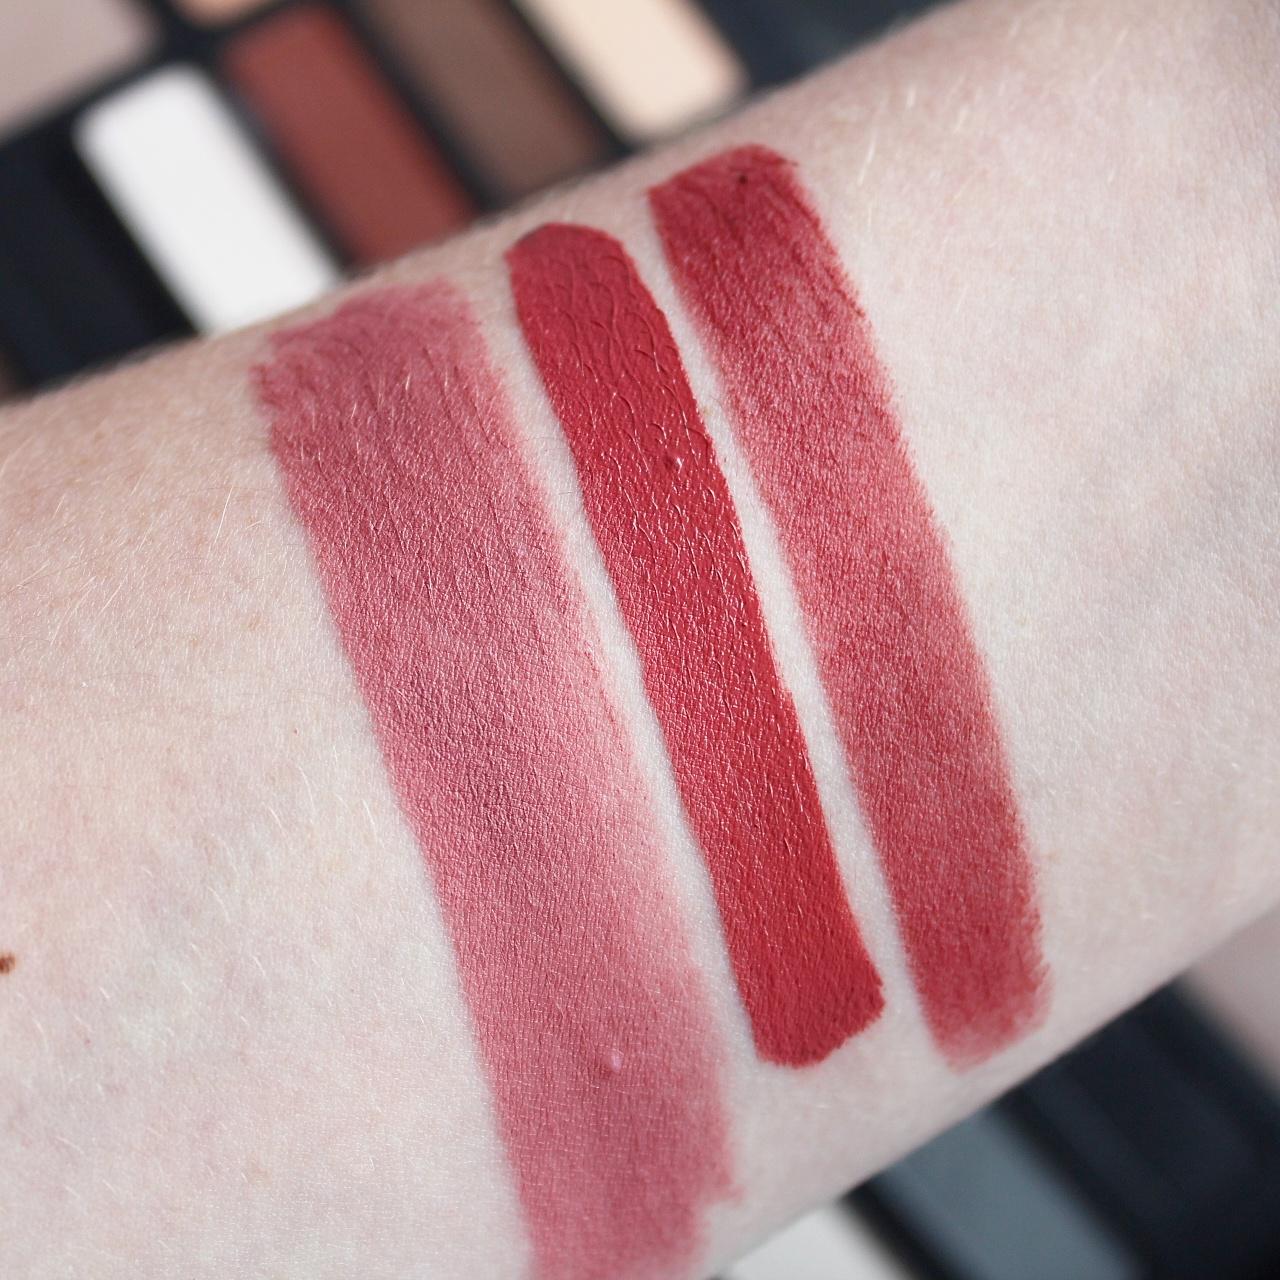 Kat Von D Beauty Studded Kiss Lipstick in Lovecraft